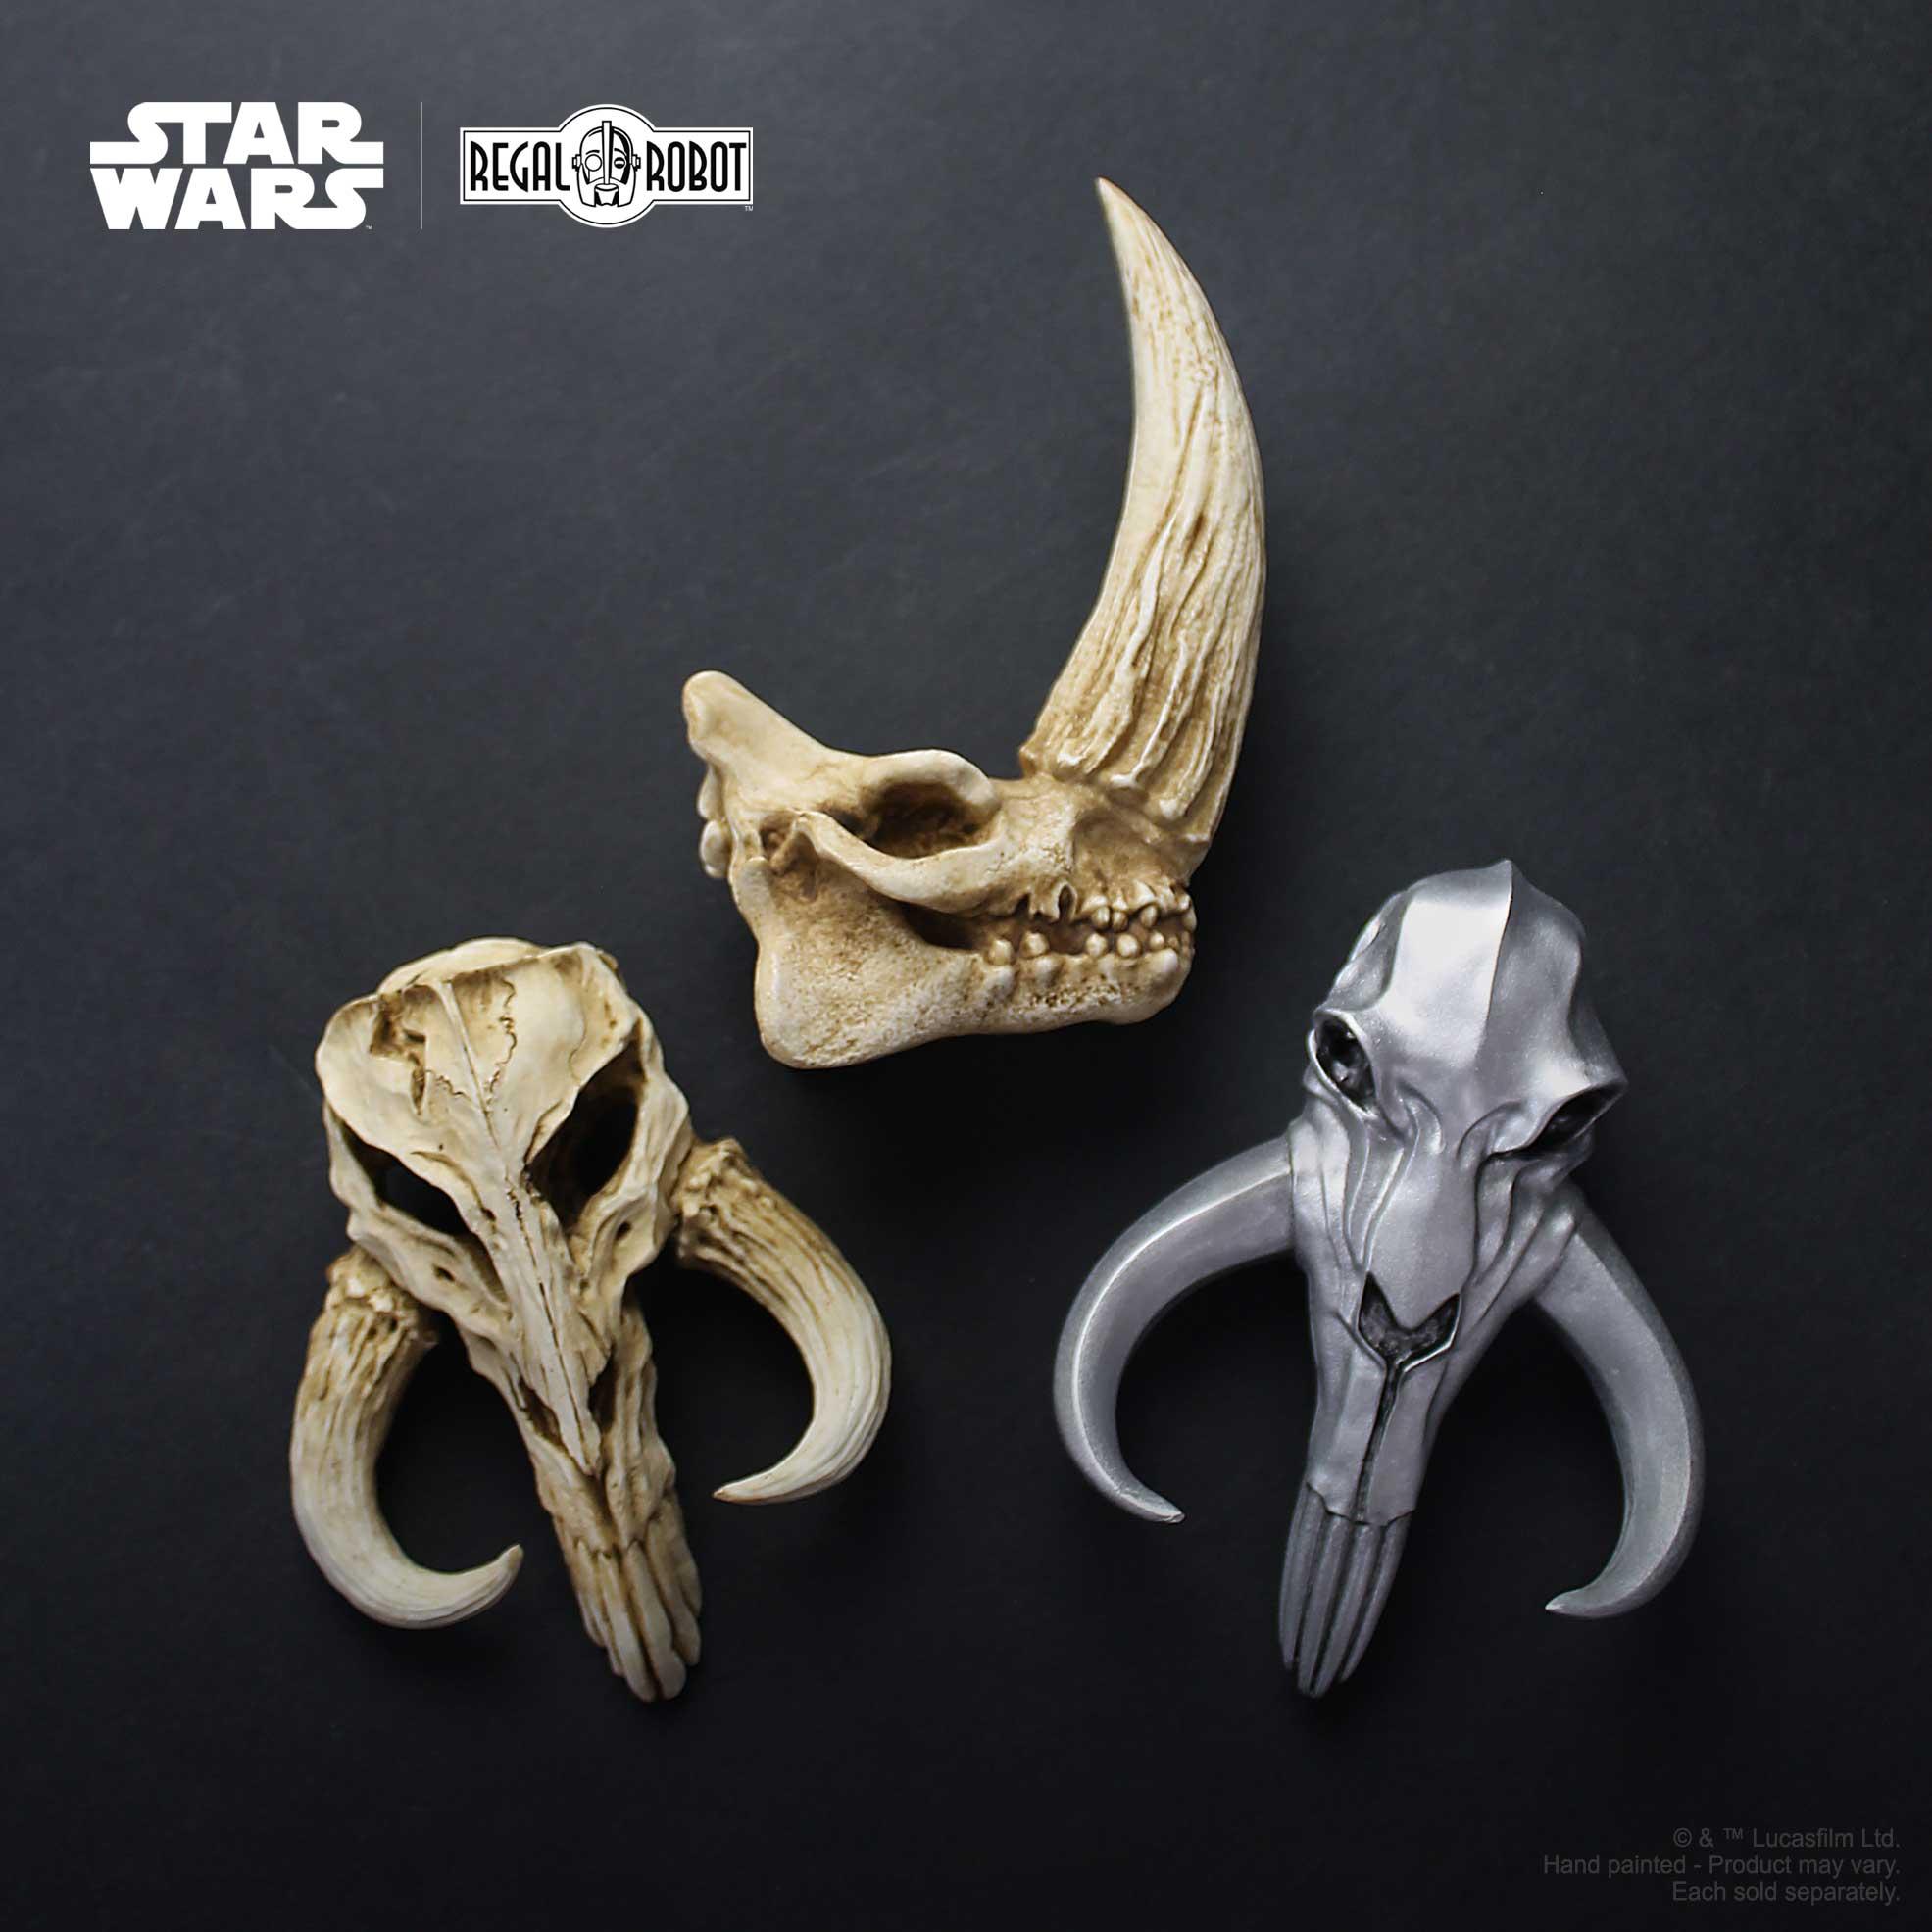 Regal Robot Mandalorian skulls and decor